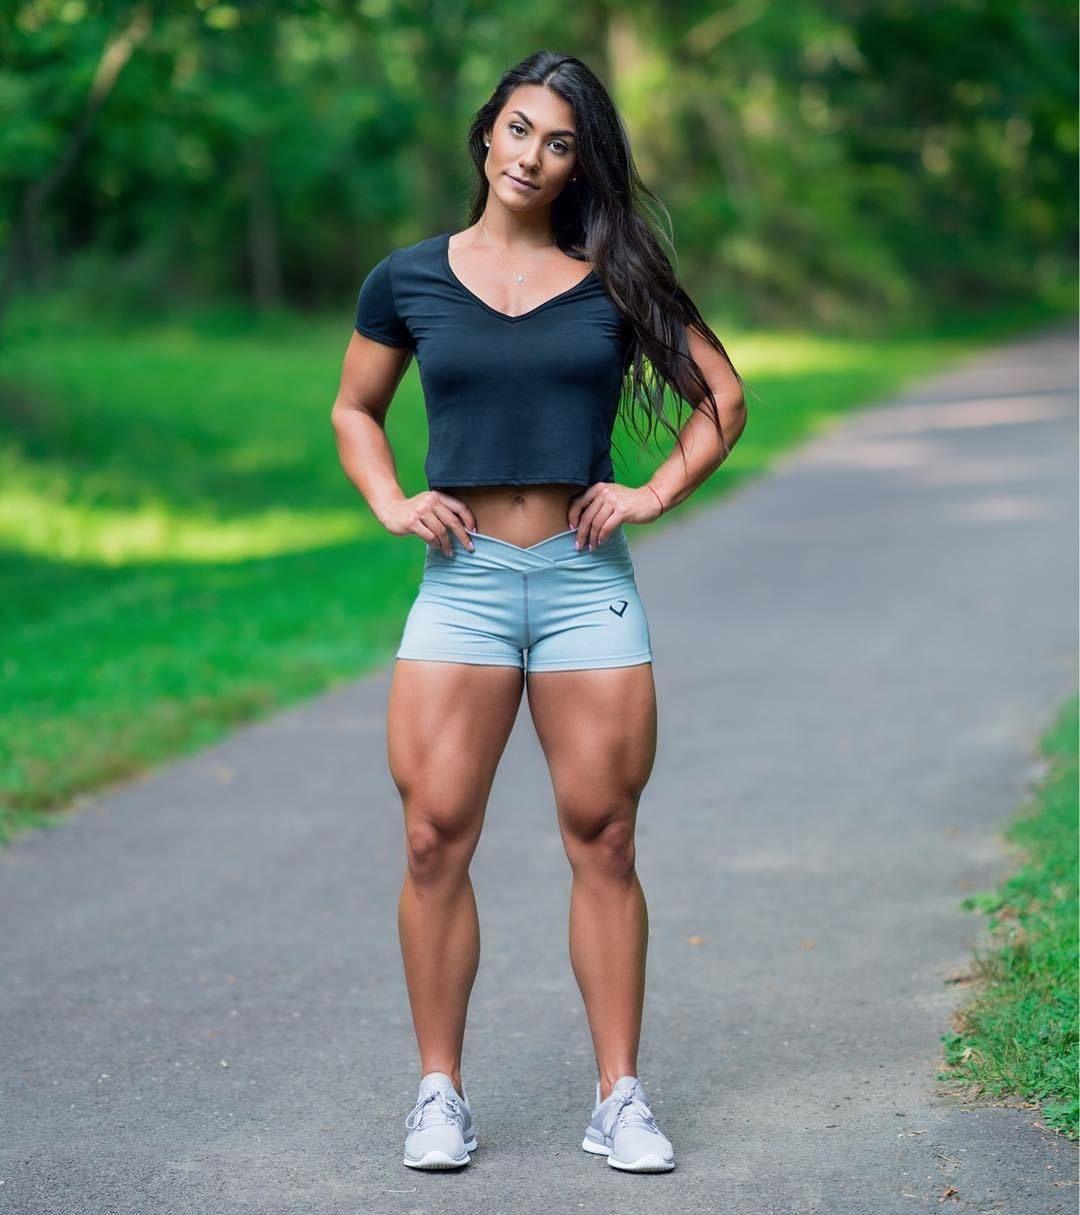 Pin On Fitness Women Muscle Girls